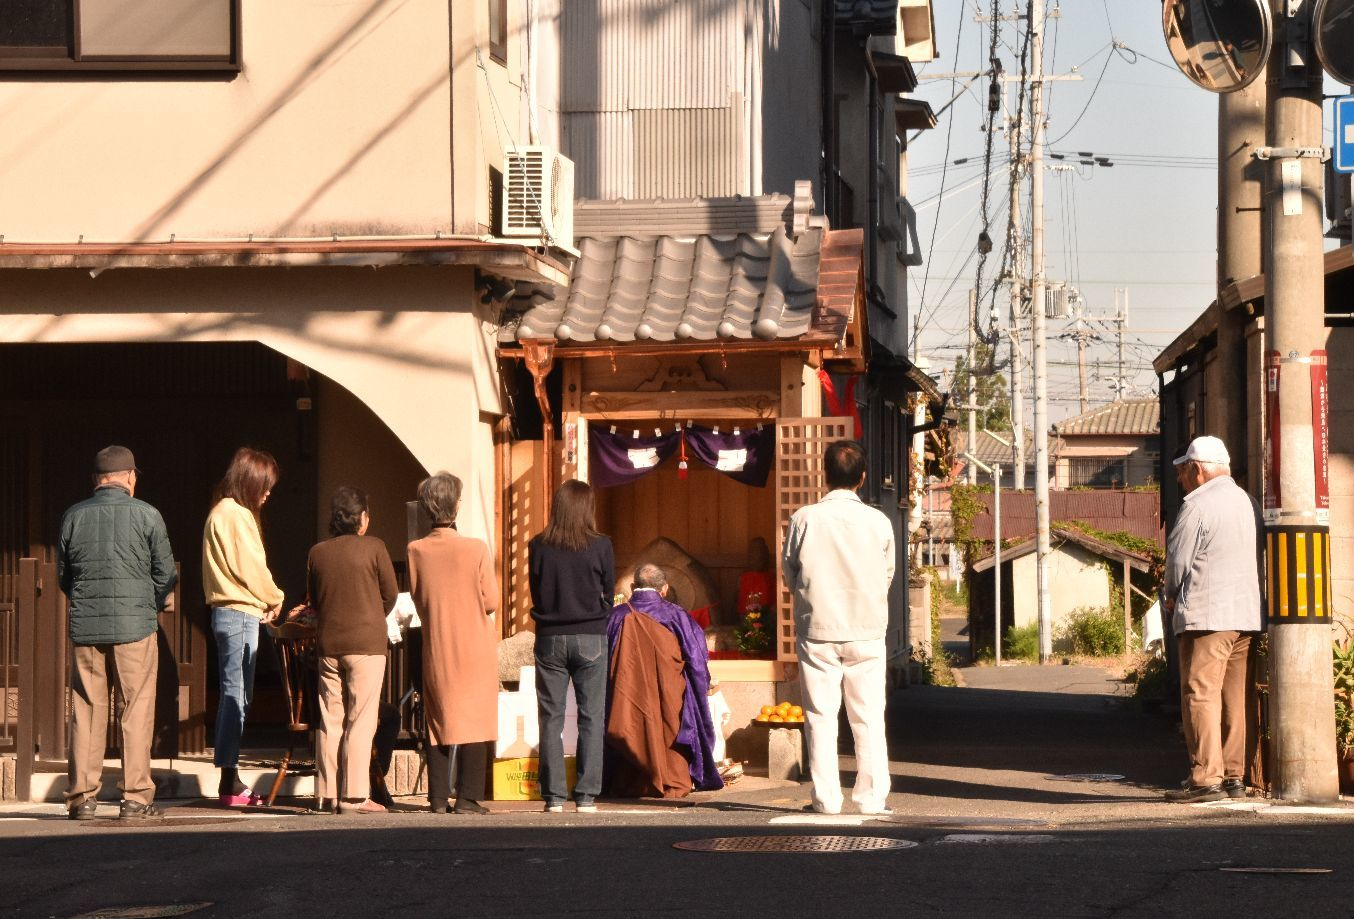 桜井市の戒重と仁王堂_a0237937_19305907.jpg